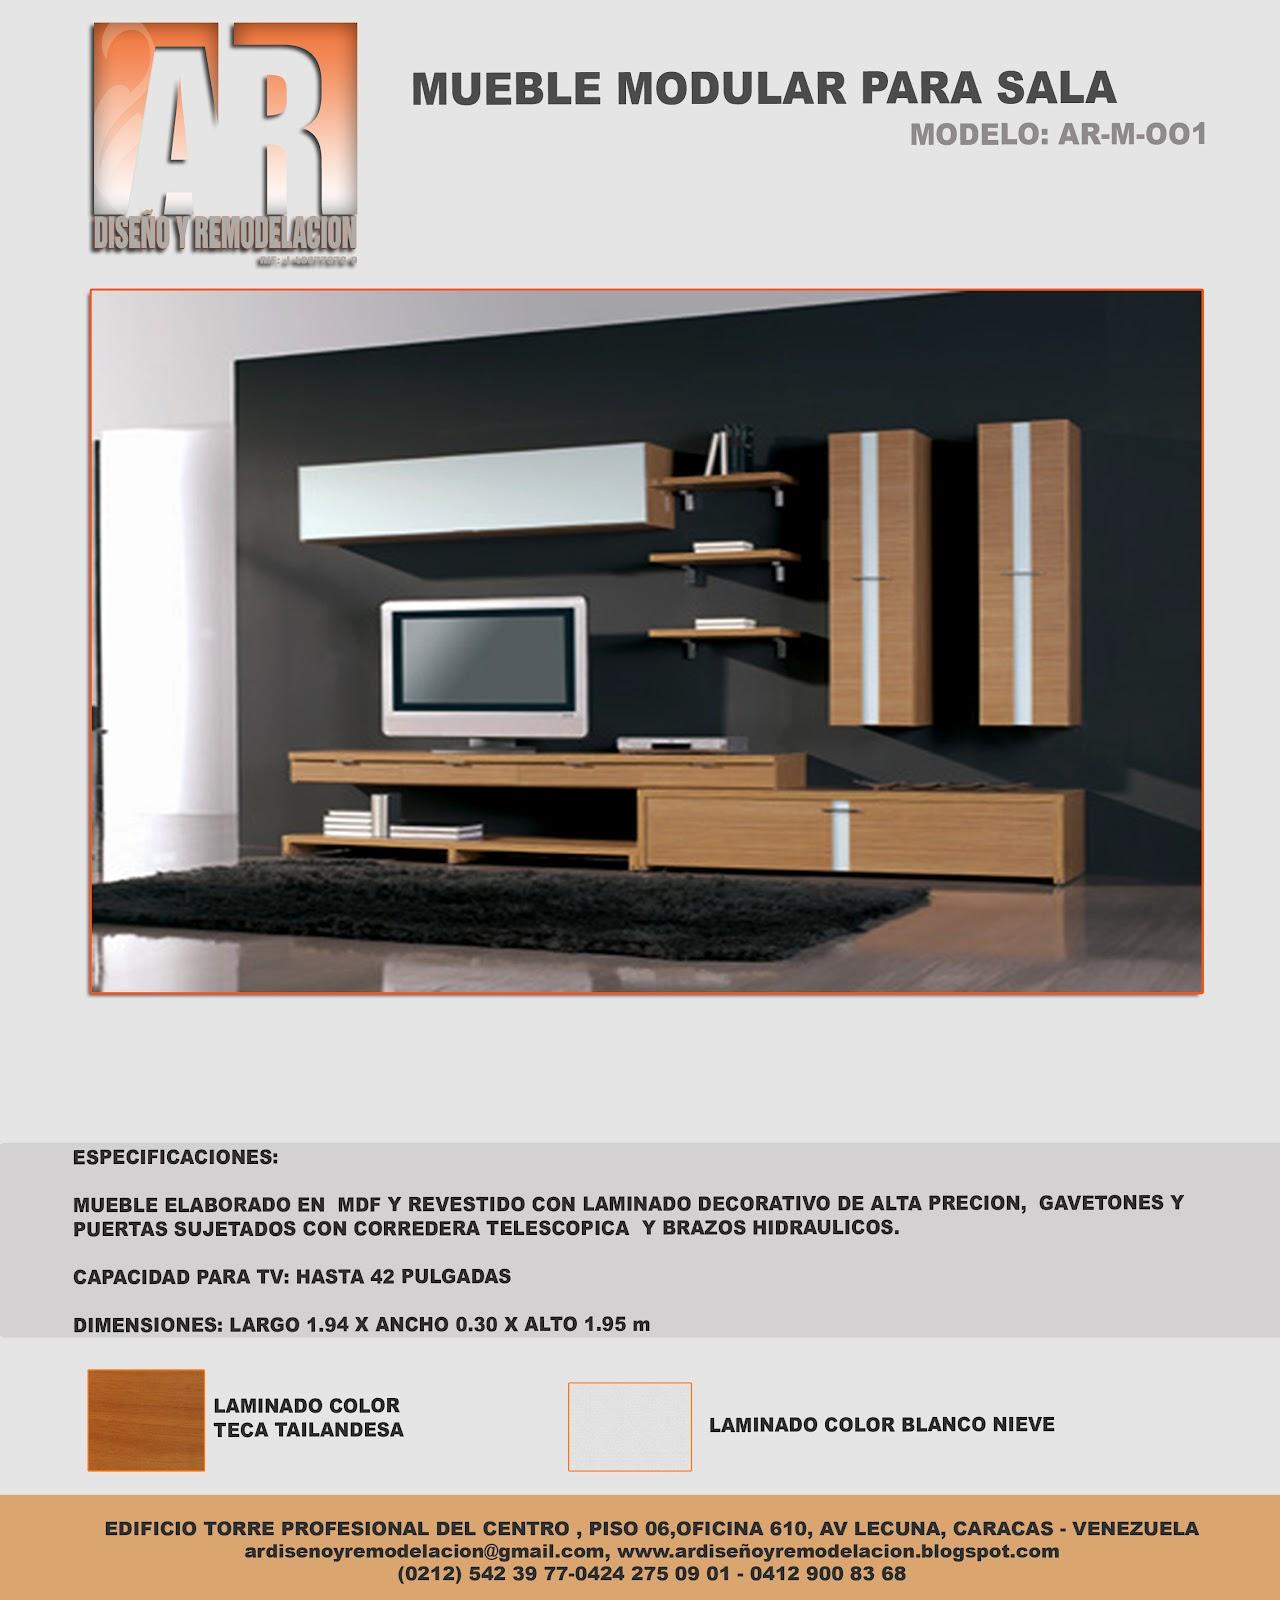 Ar dise o y remodelaci n muebles modulares para sala for Diseno de muebles modulares